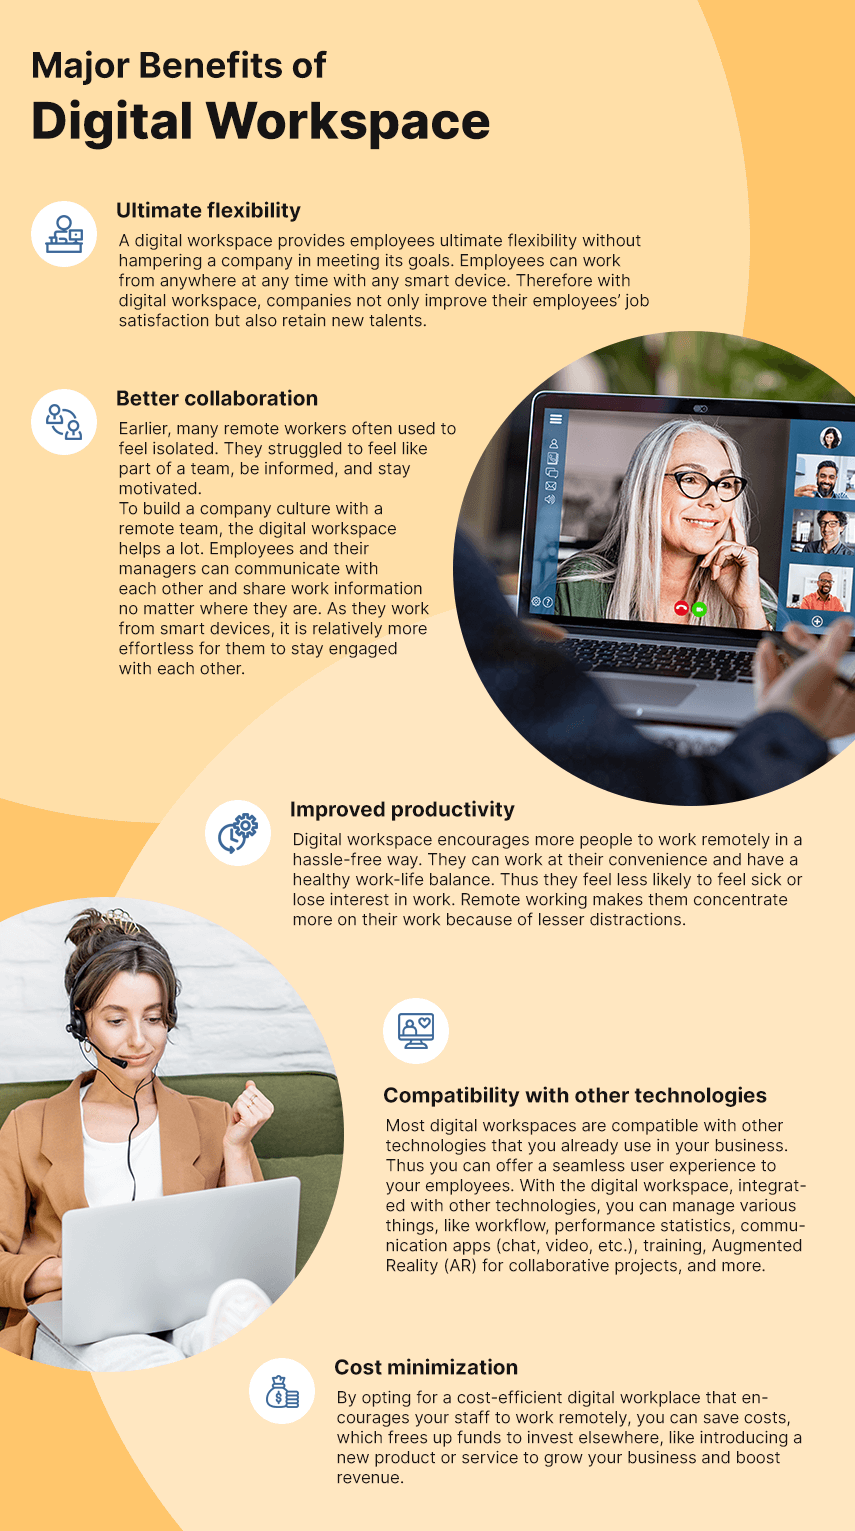 Major Benefits of Digital Workspace